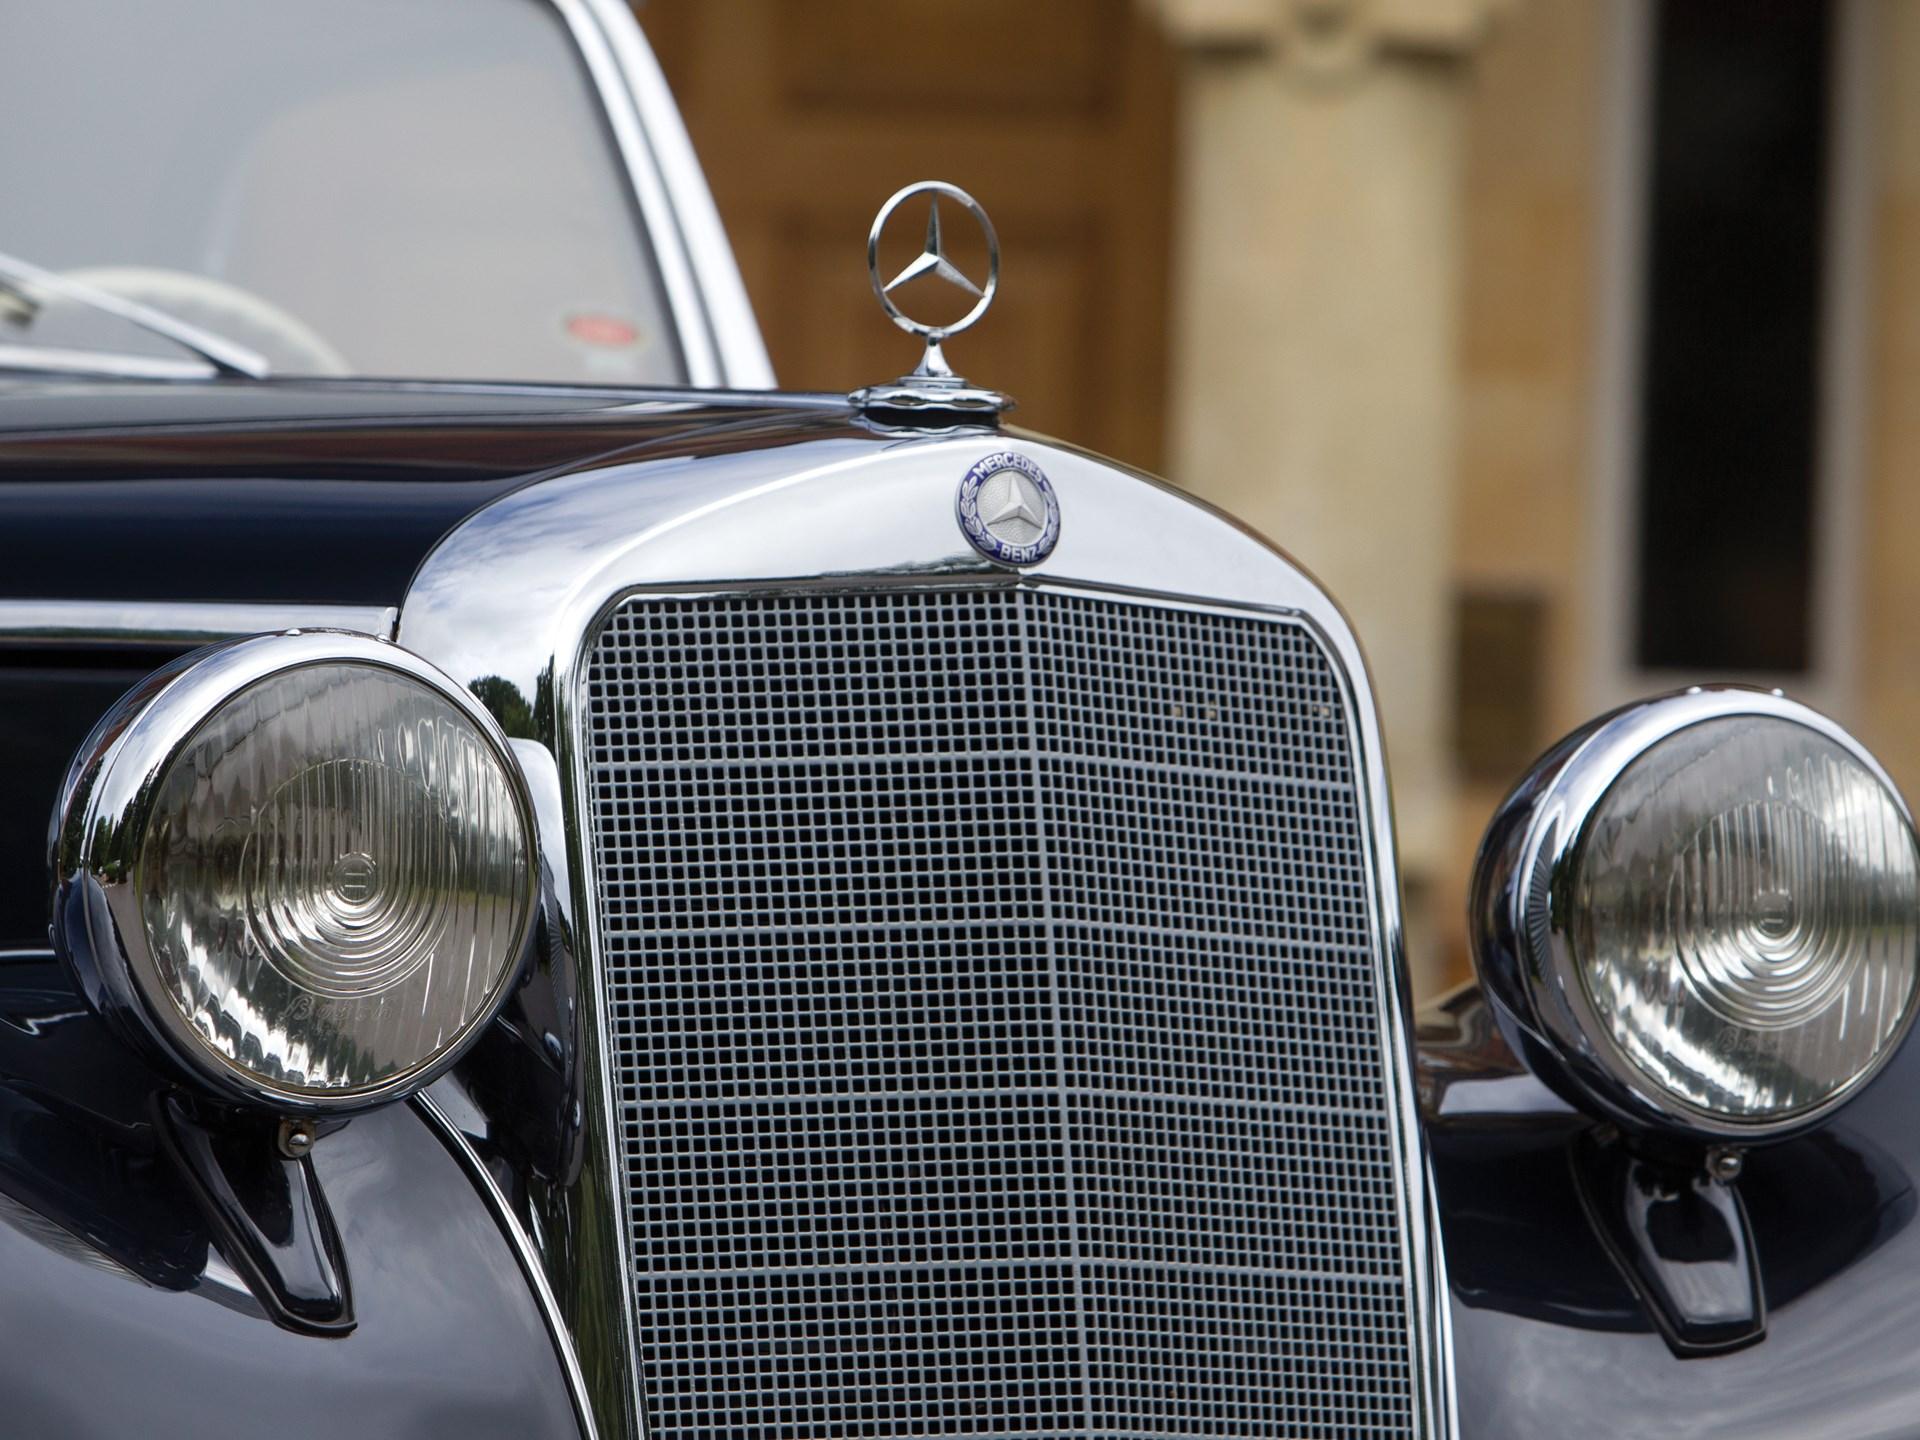 1951 Mercedes-Benz 170 S Coupé